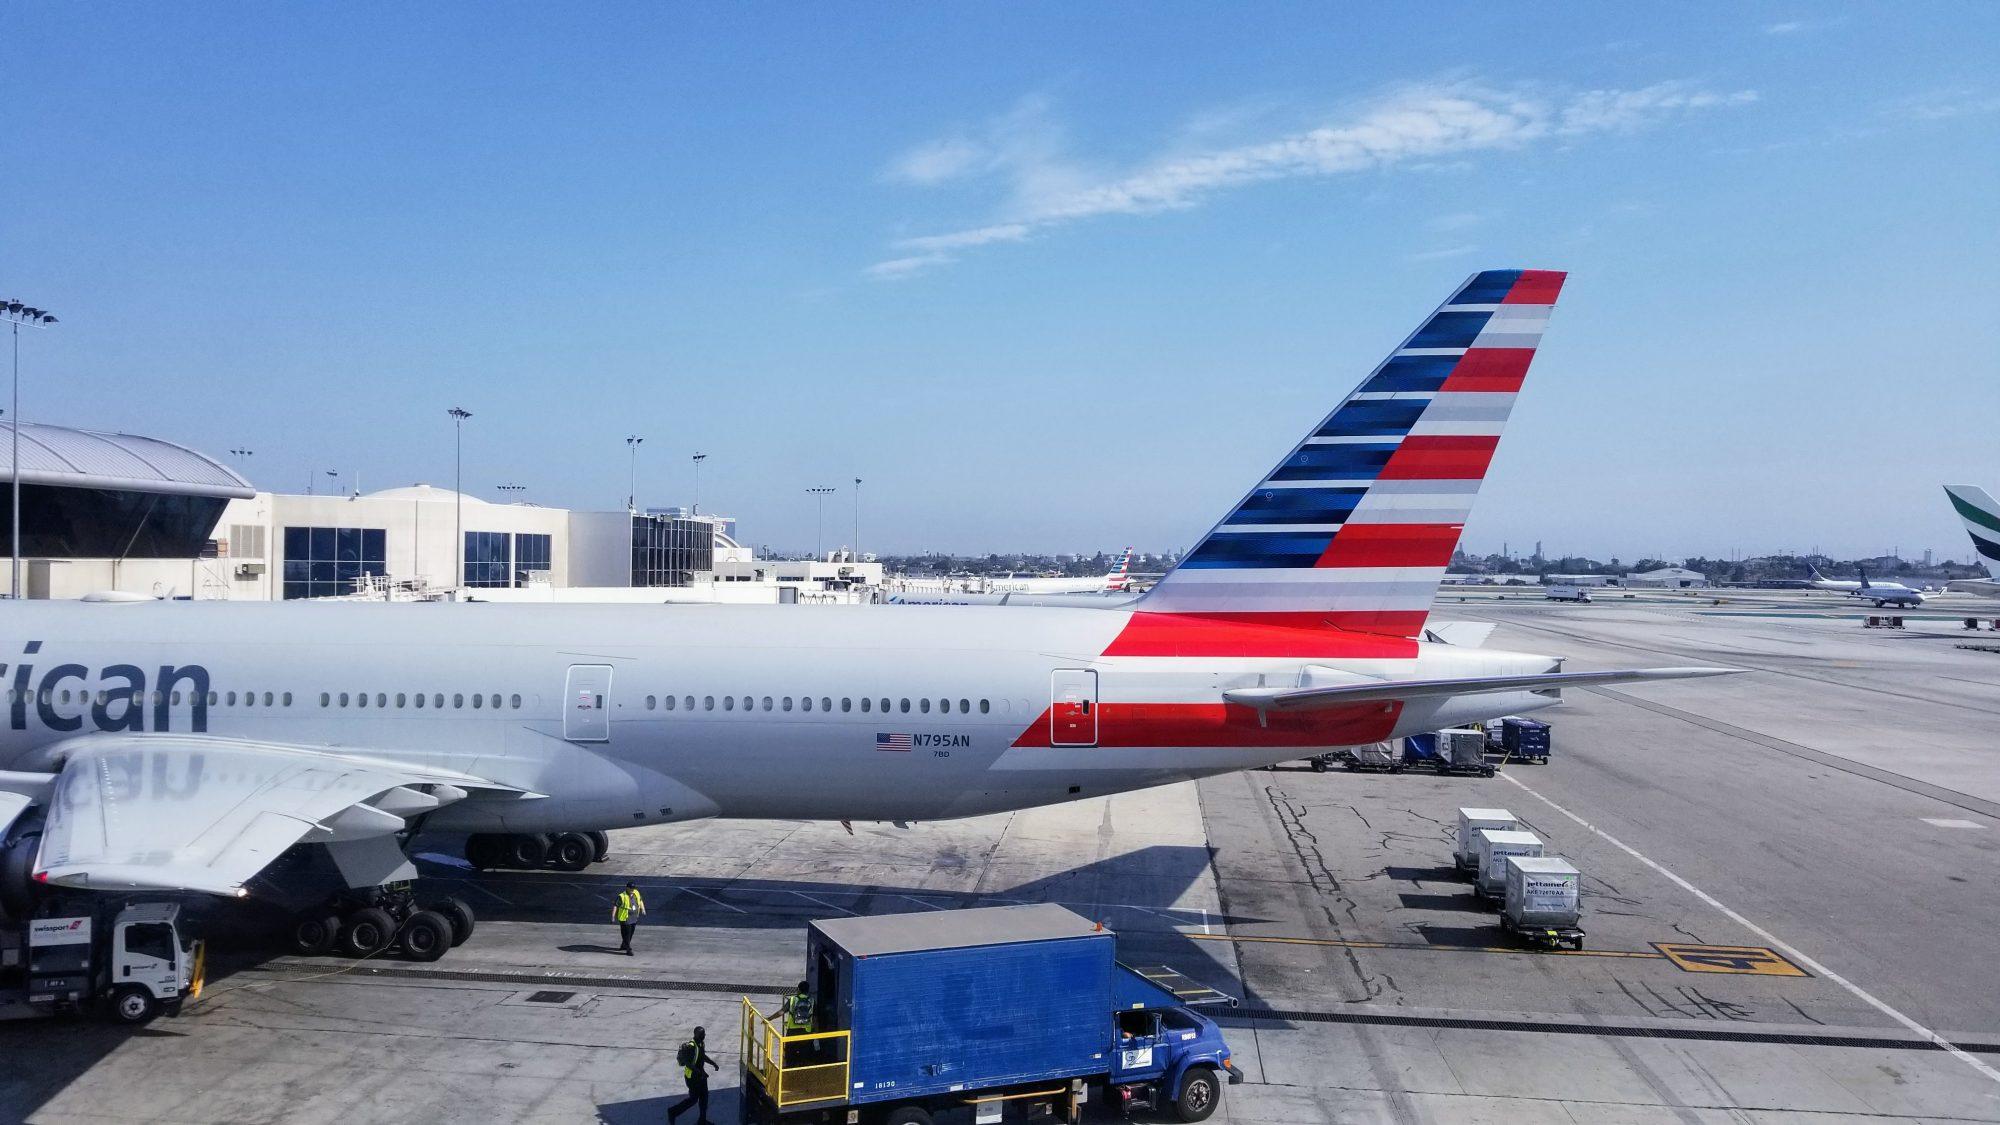 How To Get Cheap Last Minute Flights Million Mile Secrets